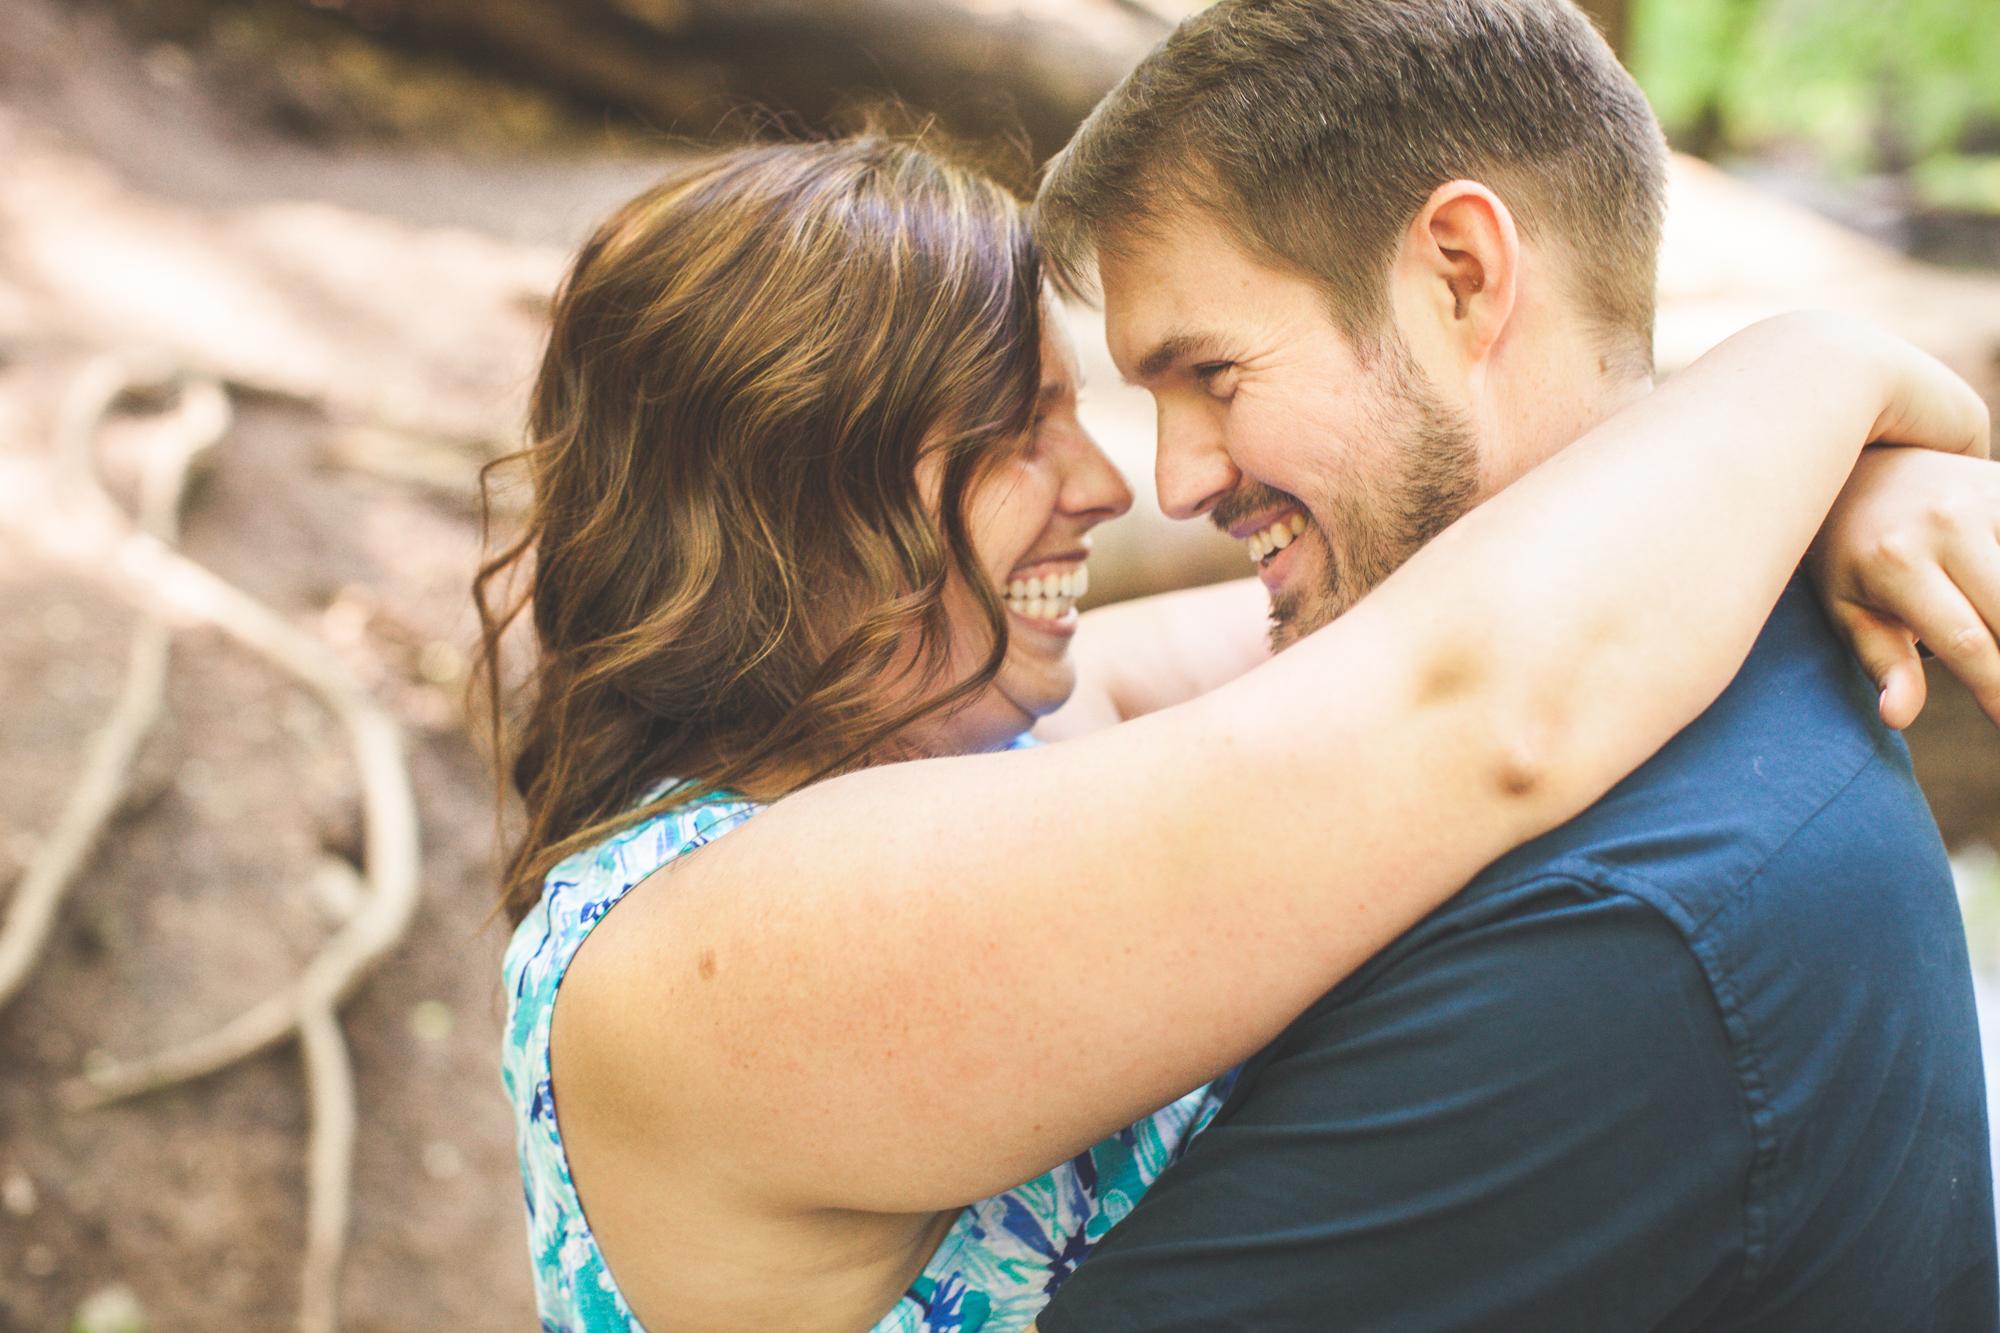 20180507-BridgetAdam-Engagement-blog-7.jpg